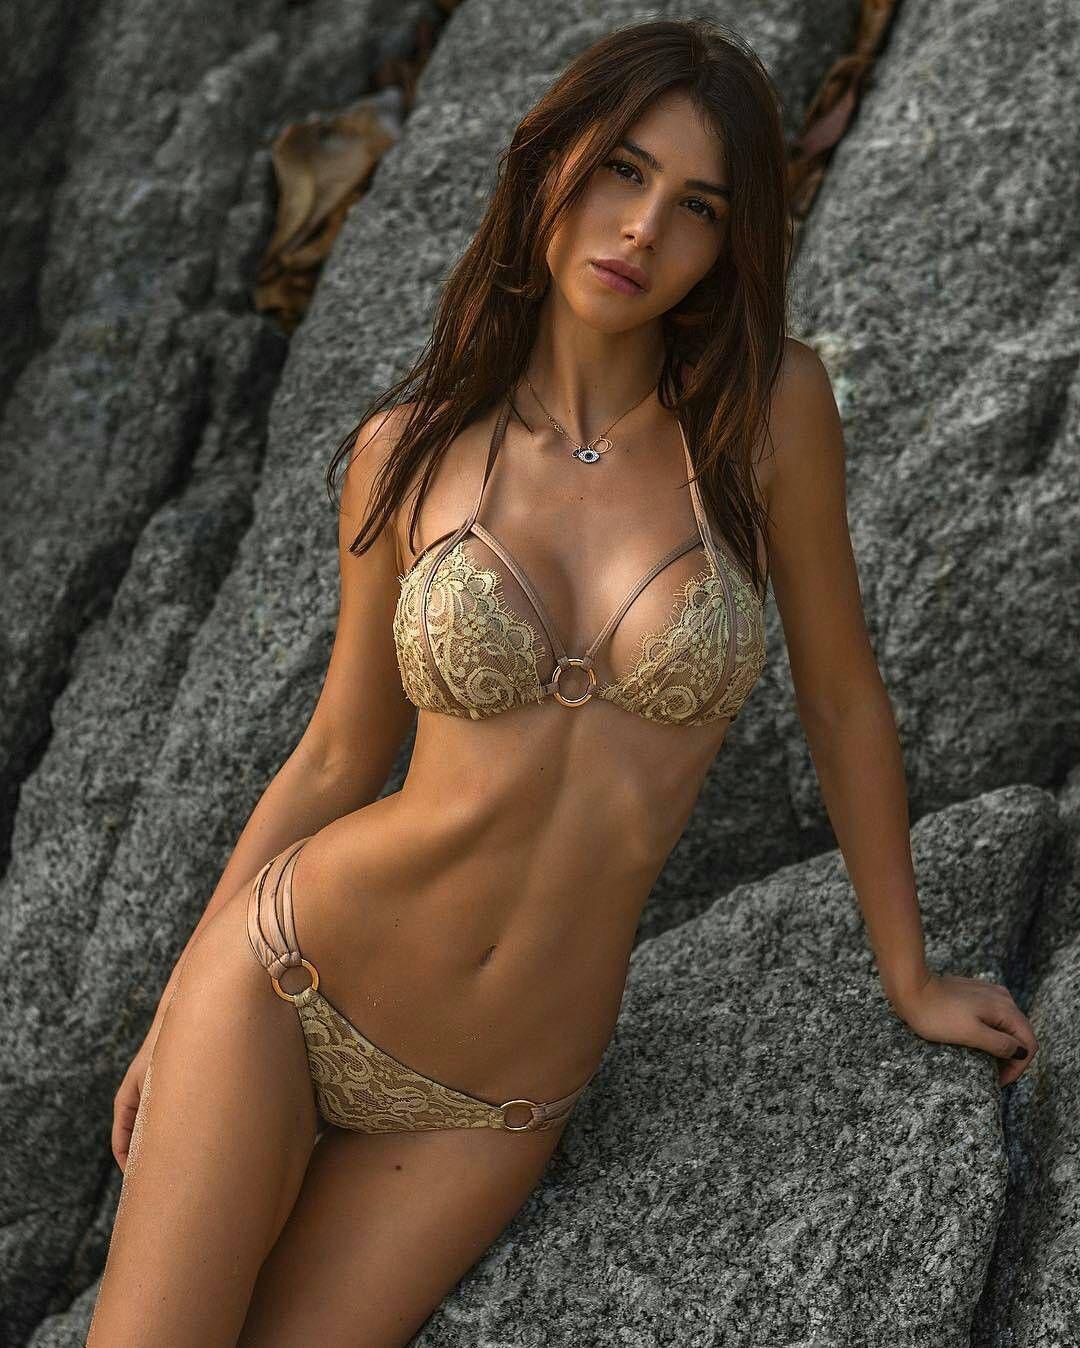 image Sexy russian girls vs bbc music video